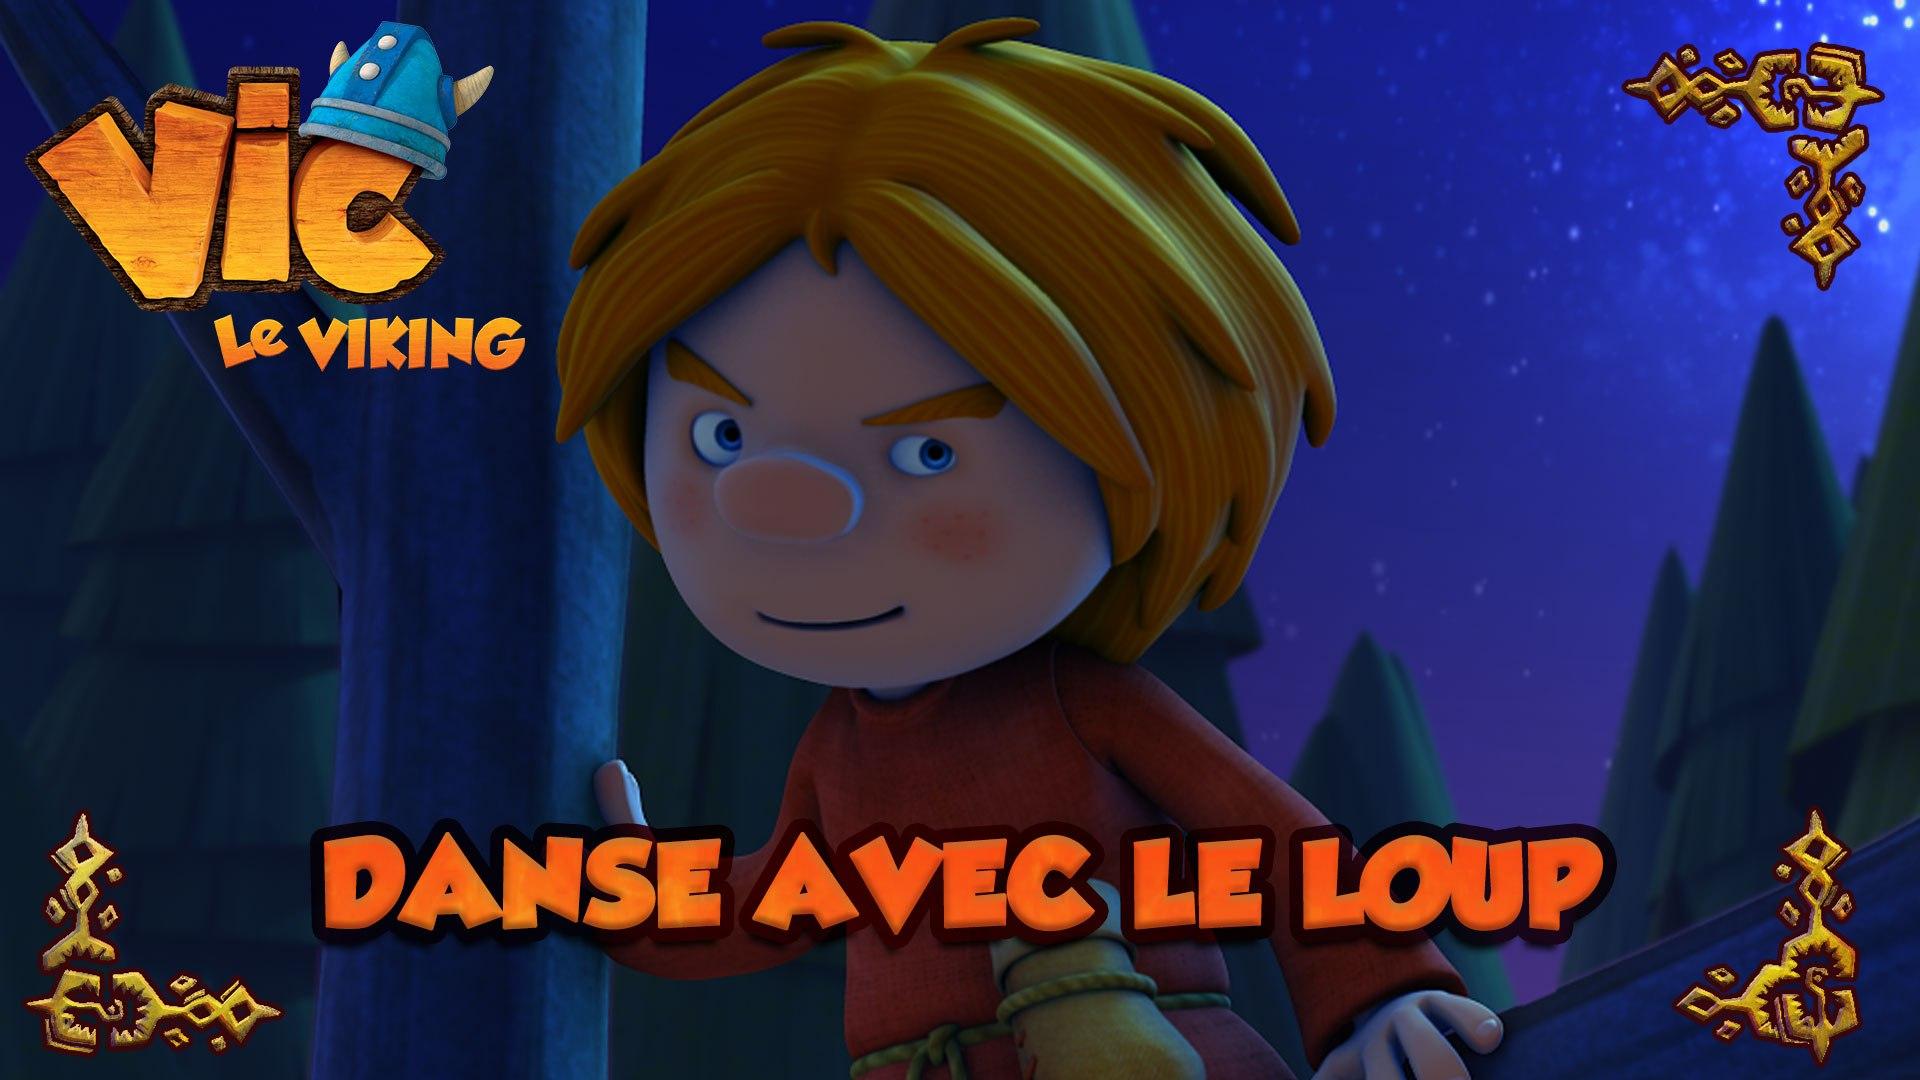 VIC THE VIKING - Studio 100 Animation